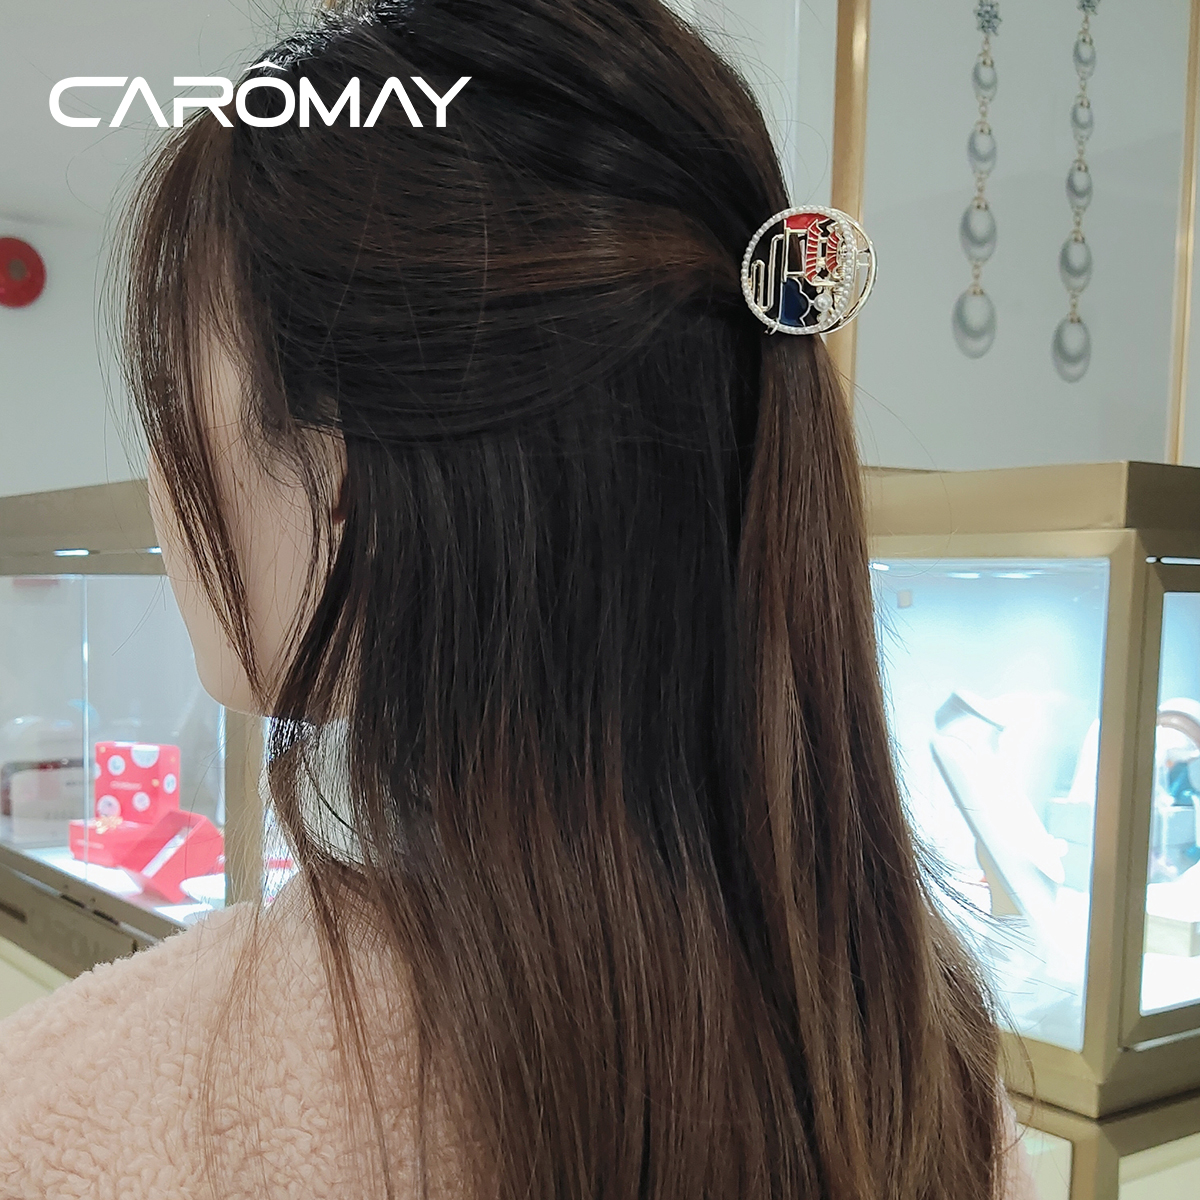 caromay凉亭流苏女宫廷风发夹,30元左右优雅女生礼物